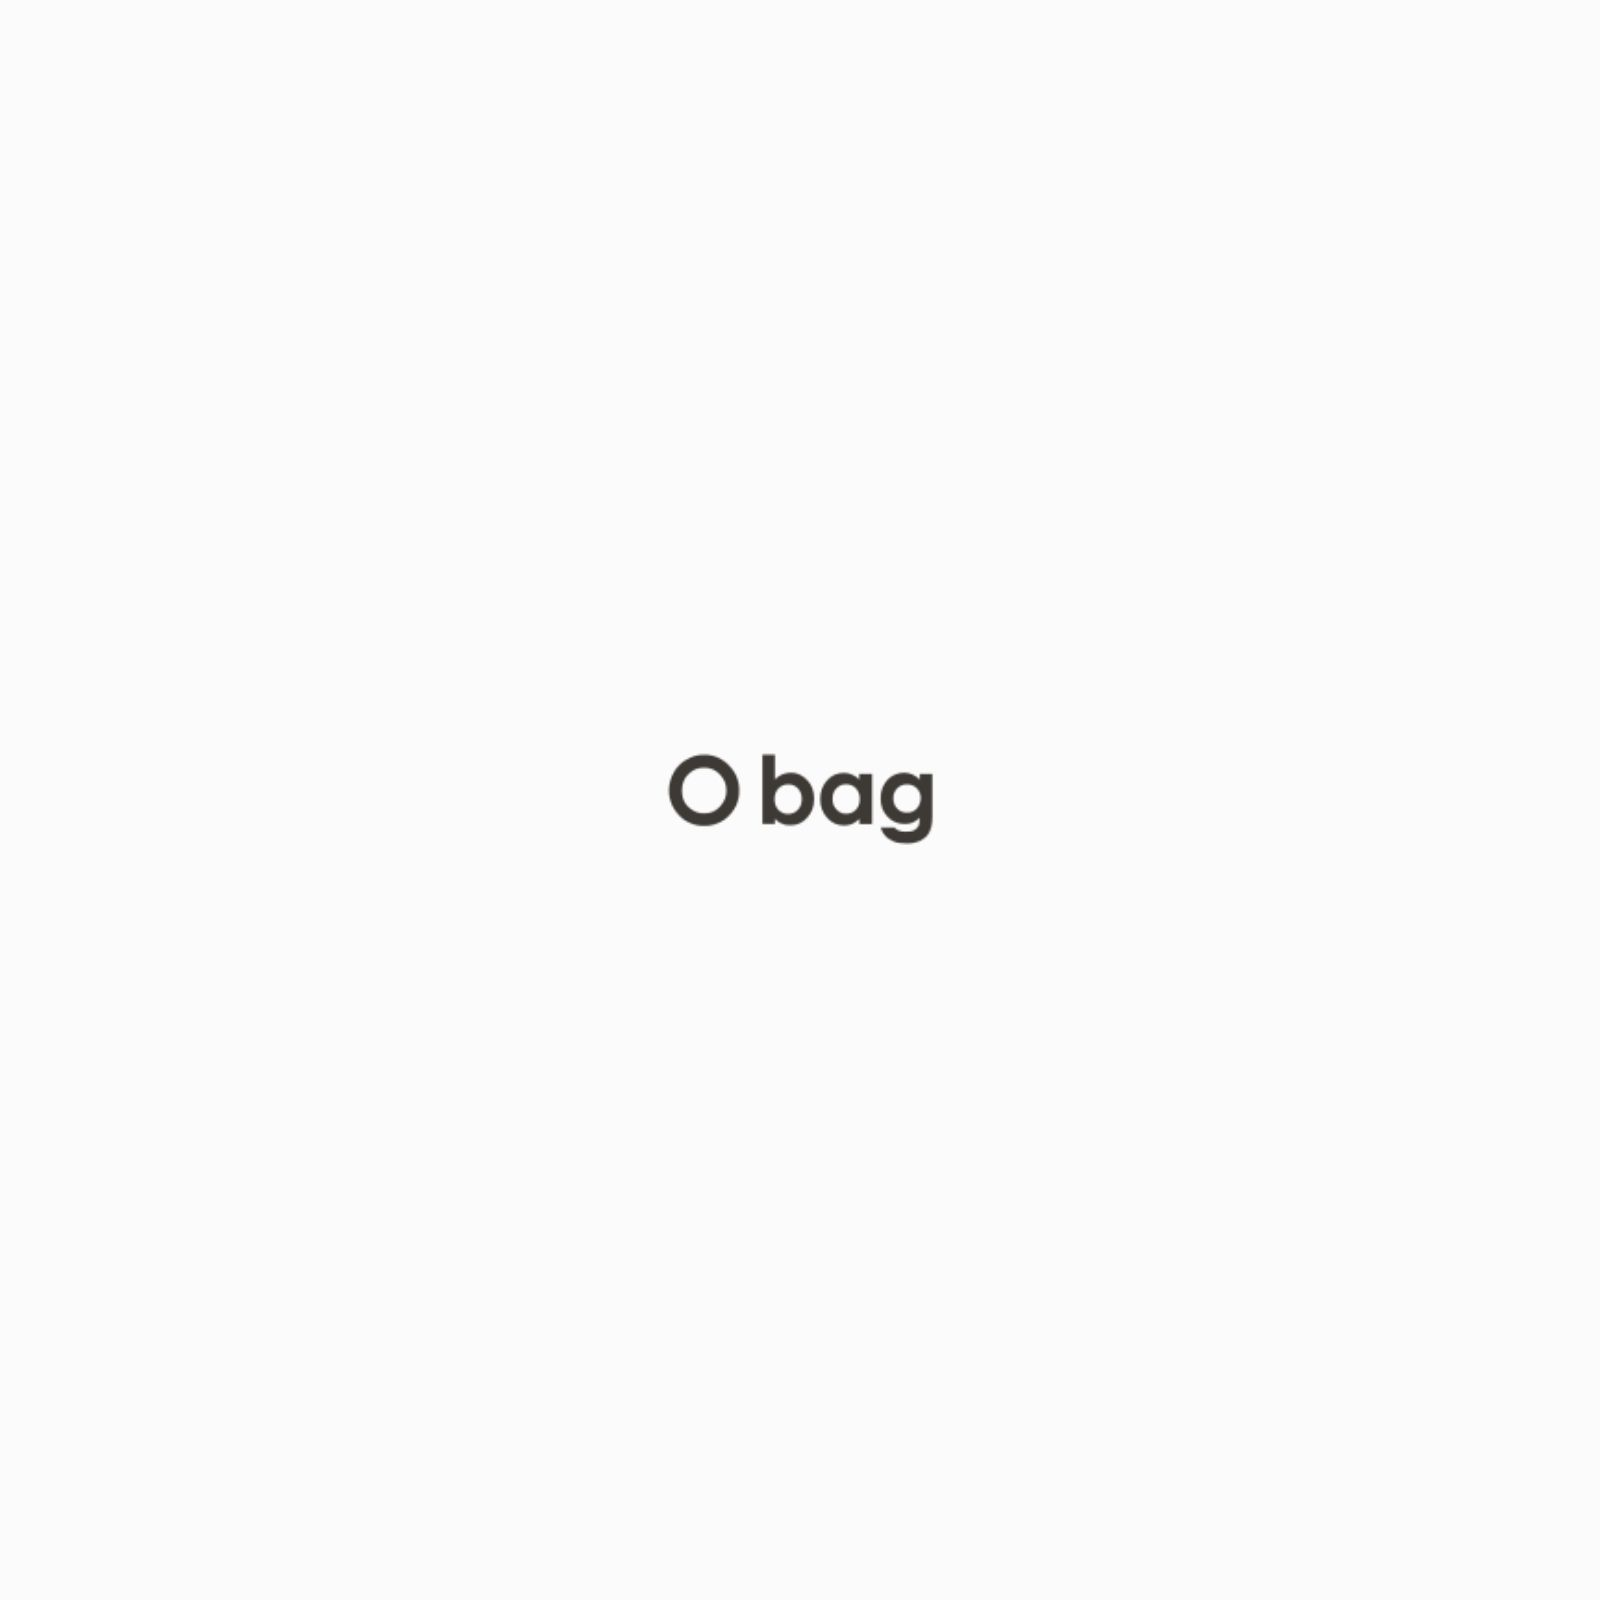 d62d3dae165e0 O bag O bag - taschen